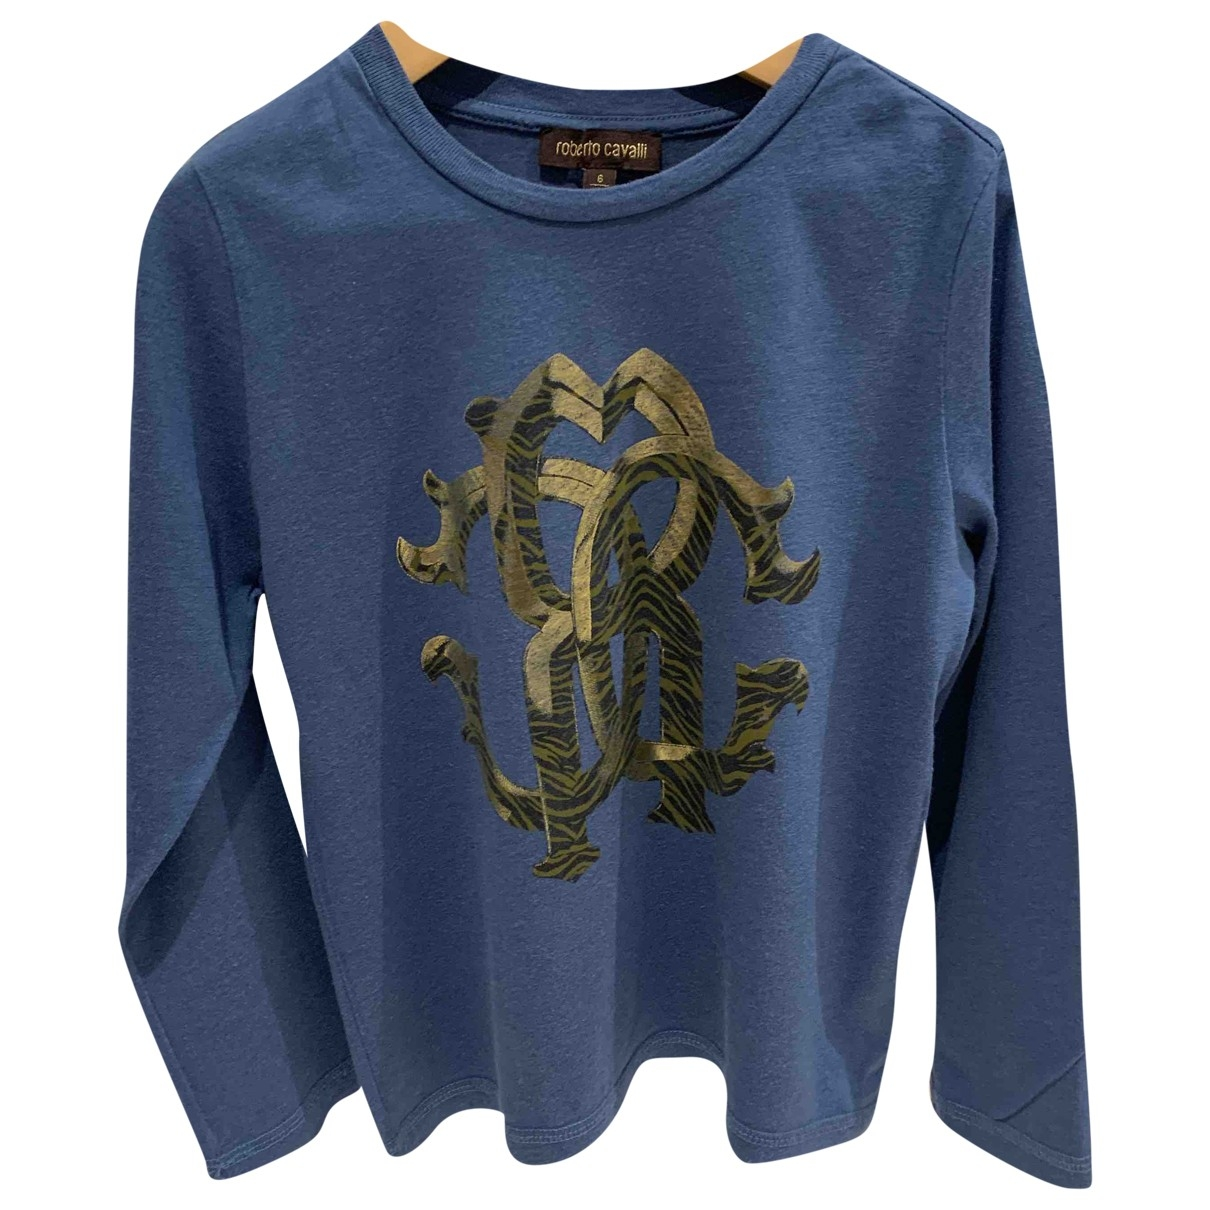 Roberto Cavalli - Top   pour enfant en coton - bleu